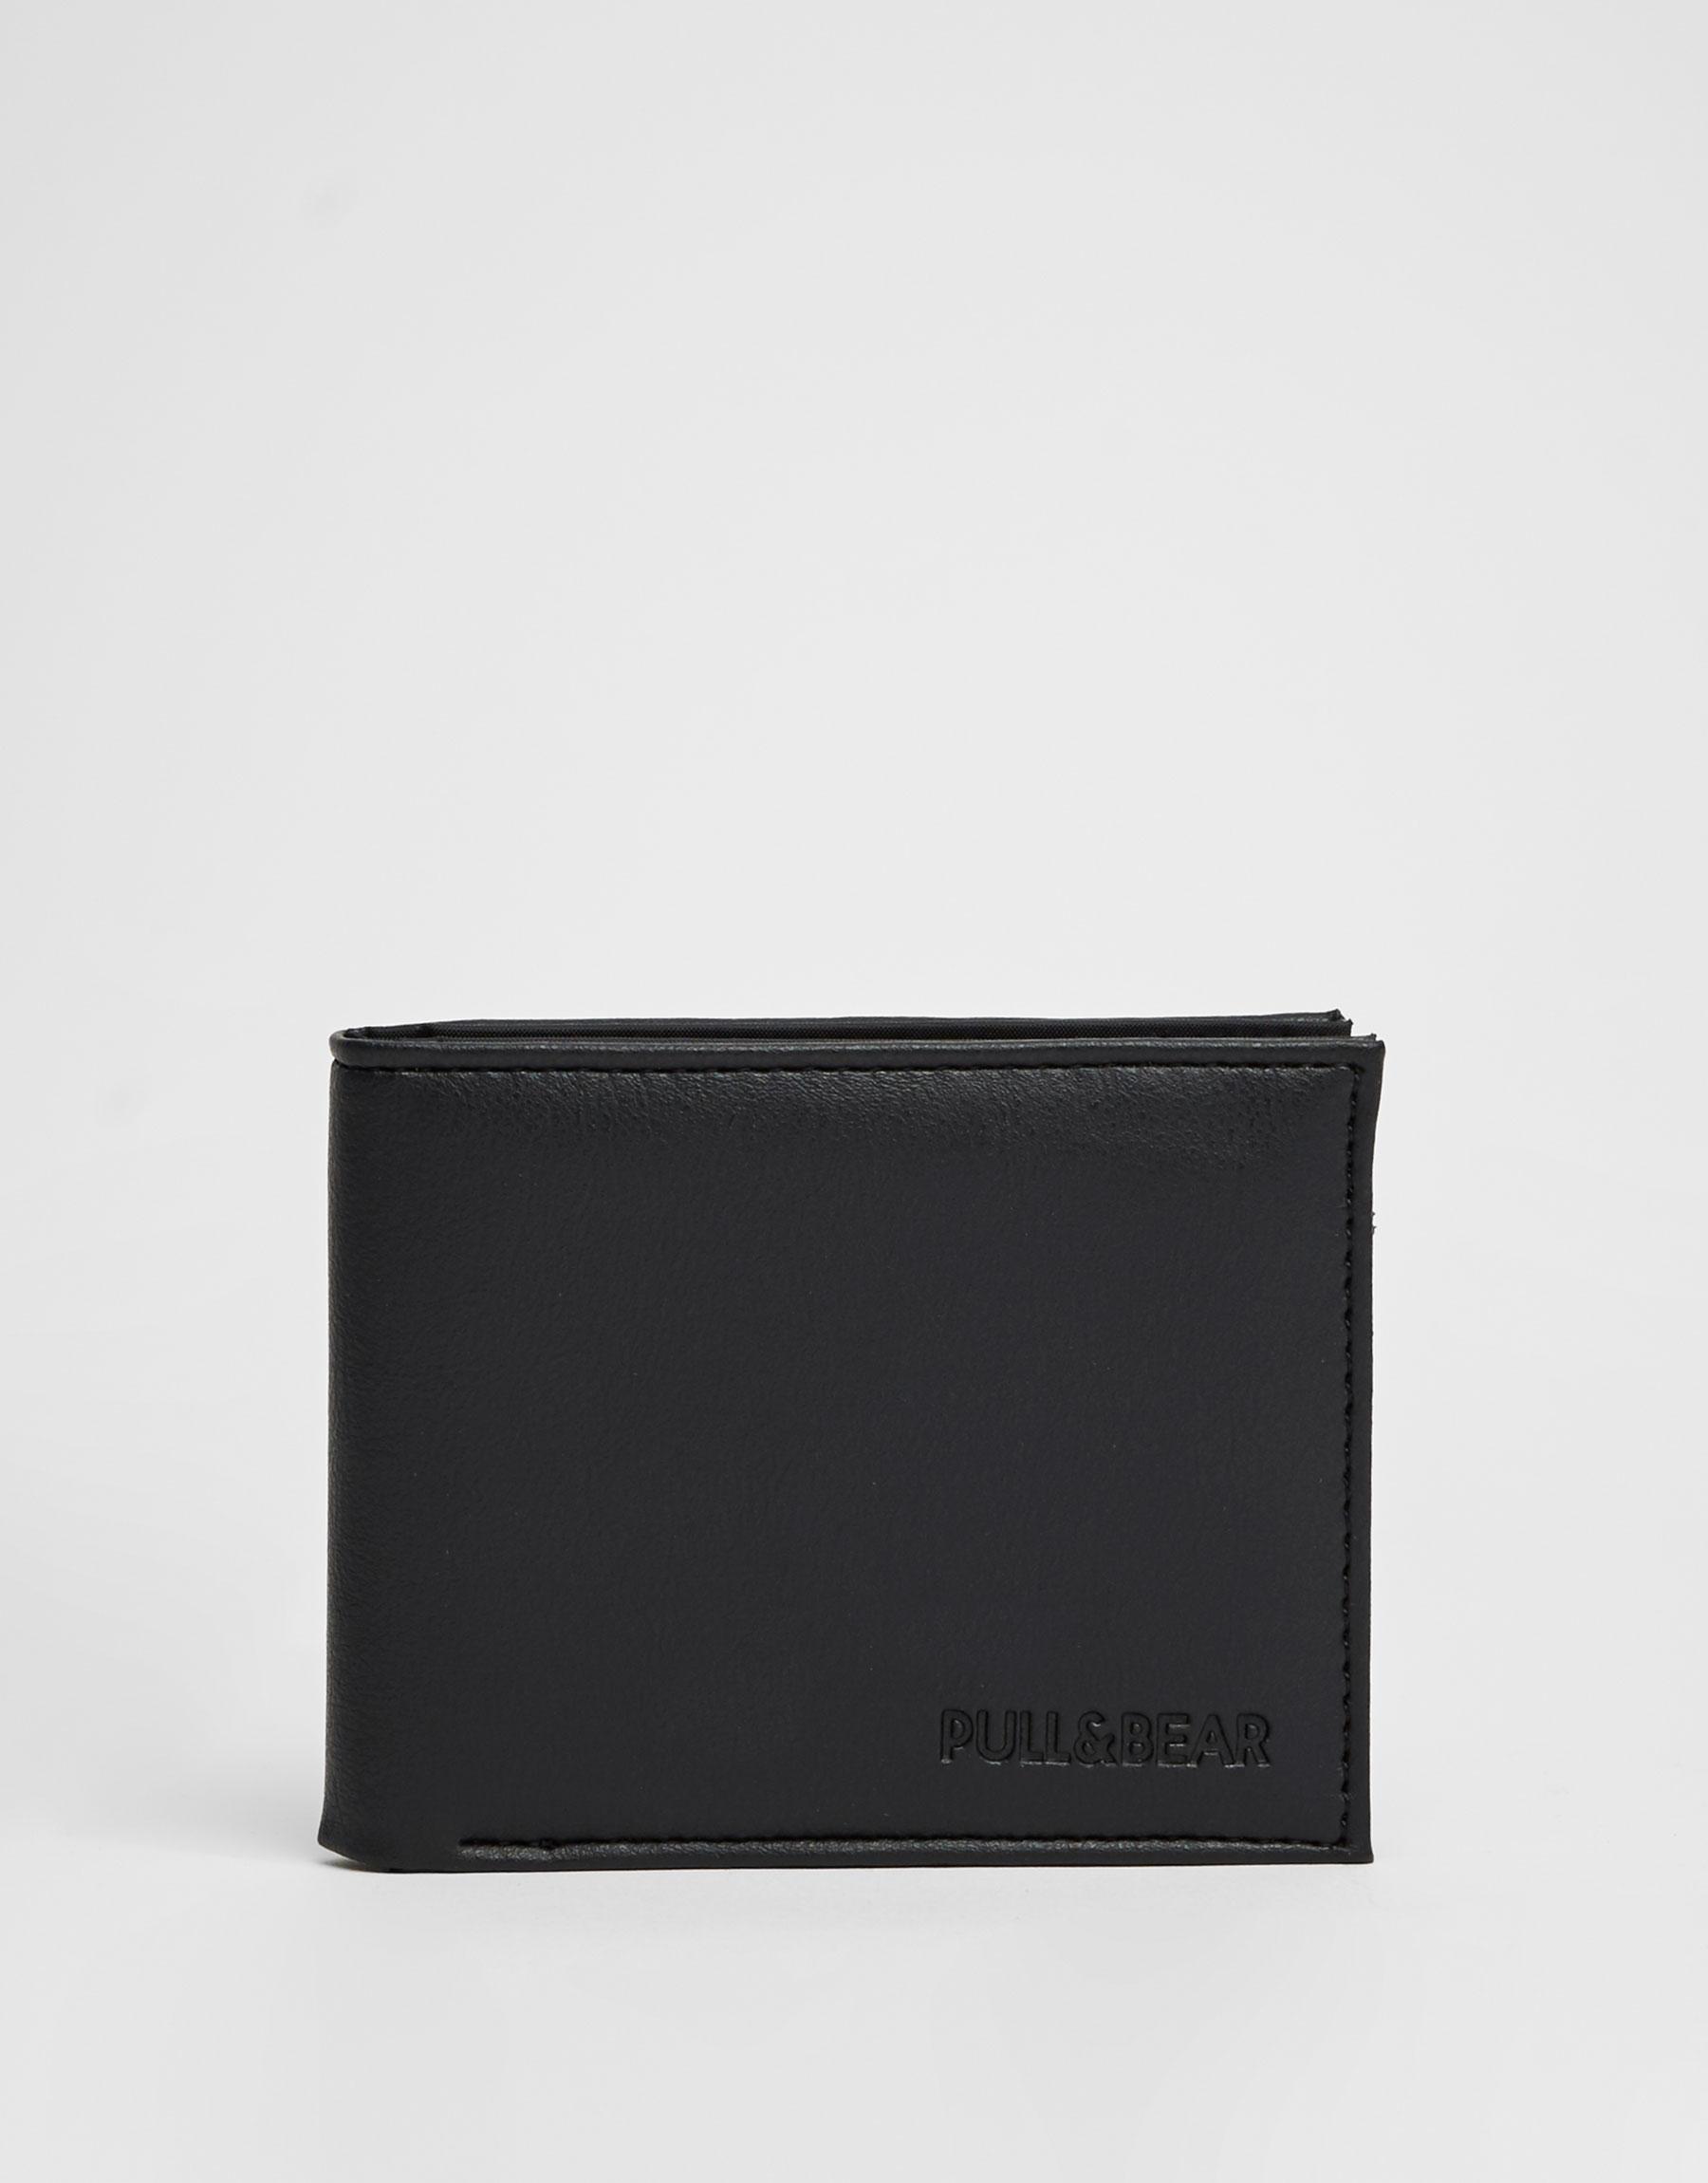 Basic pullandbear wallet